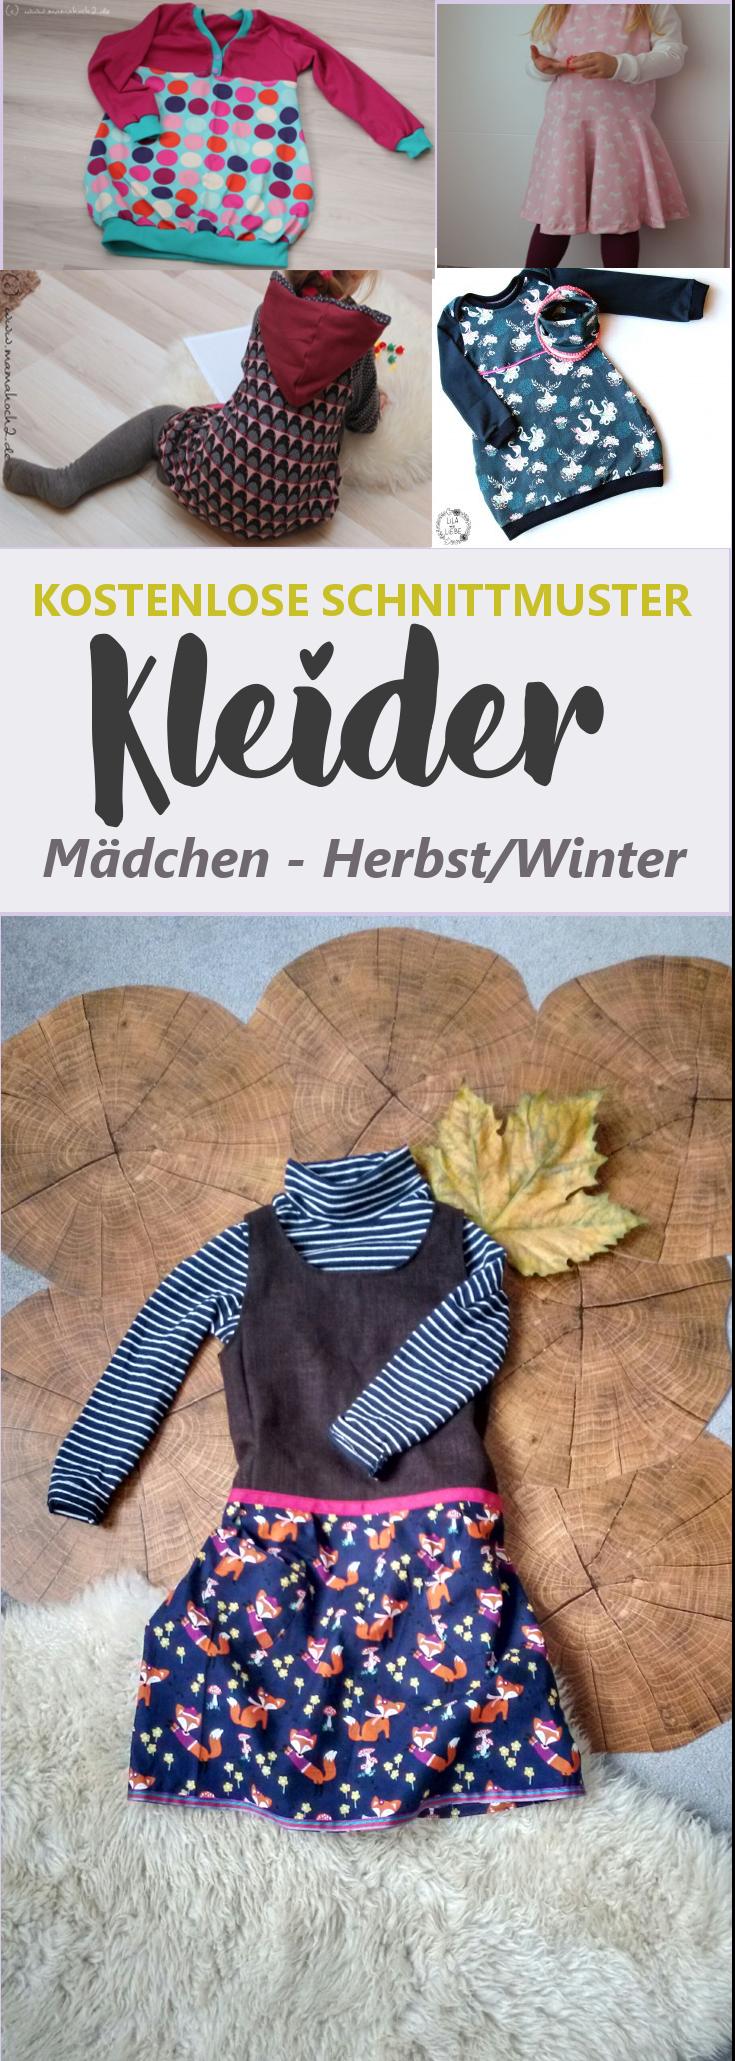 Schnittmuster Kleid Mädchen kostenlos | Herbst/Winter • eager self #freebookschnittmuster